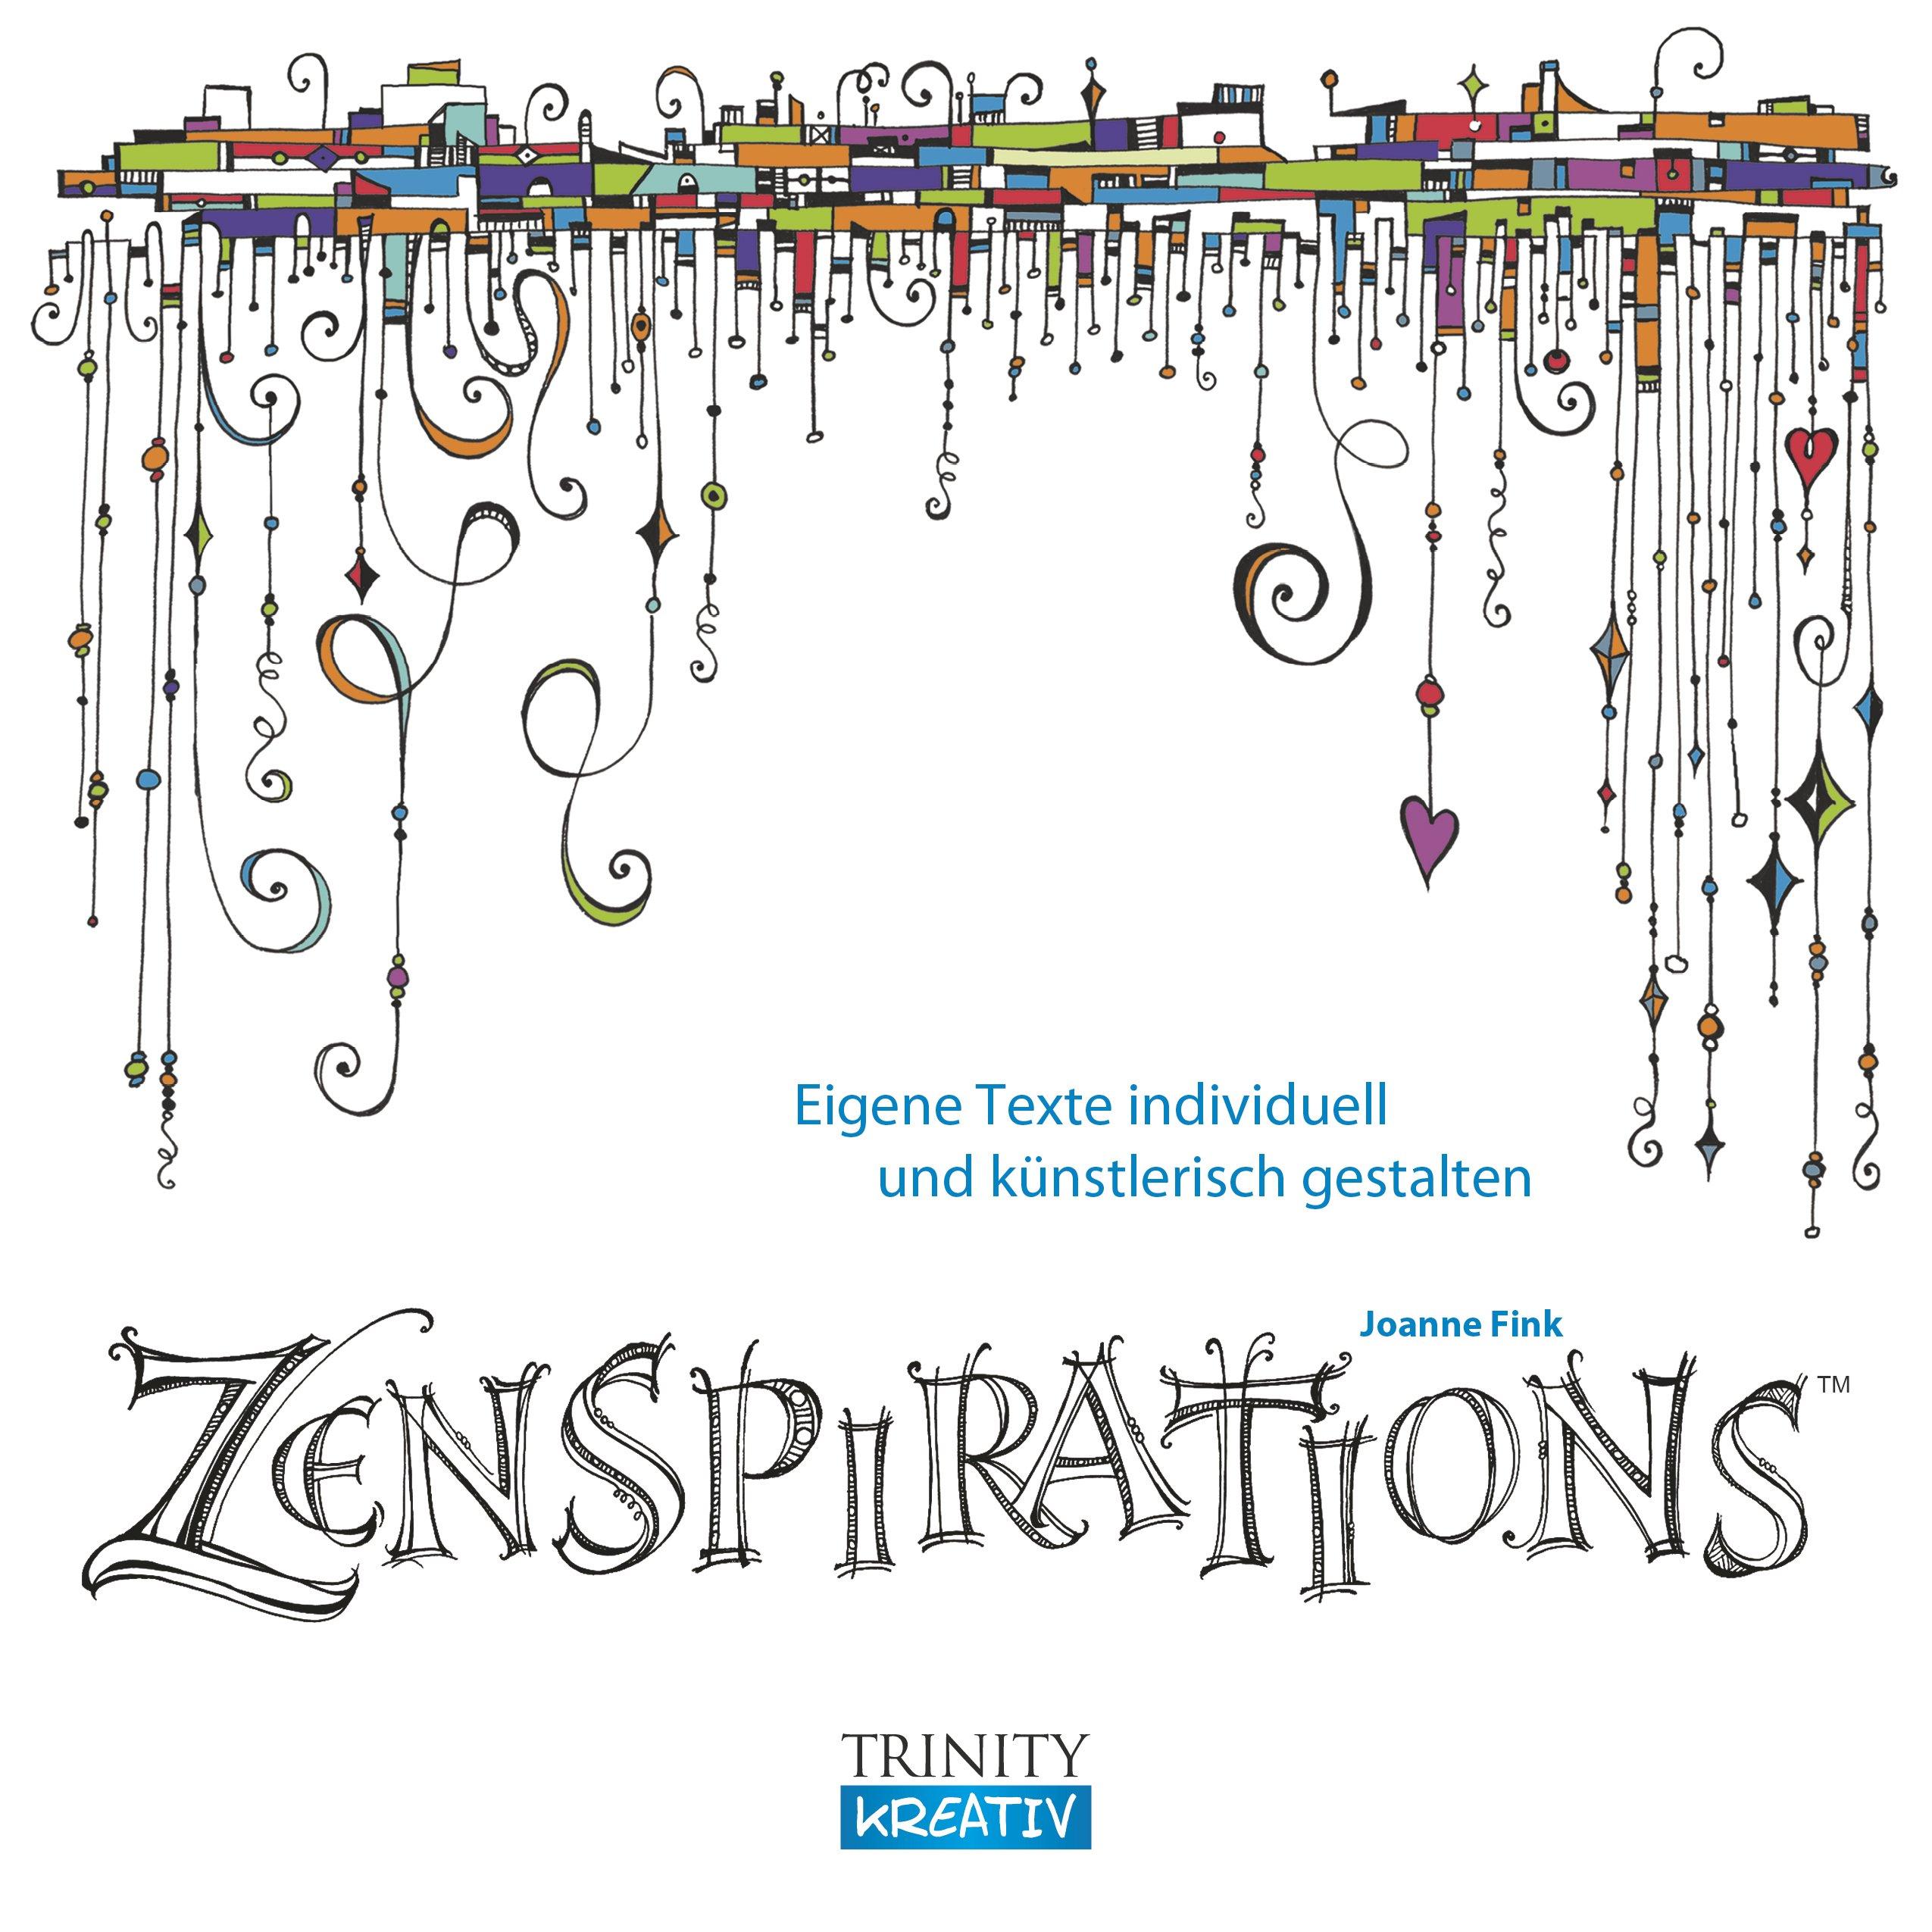 http://trinity-kreativ.de/zenspirations